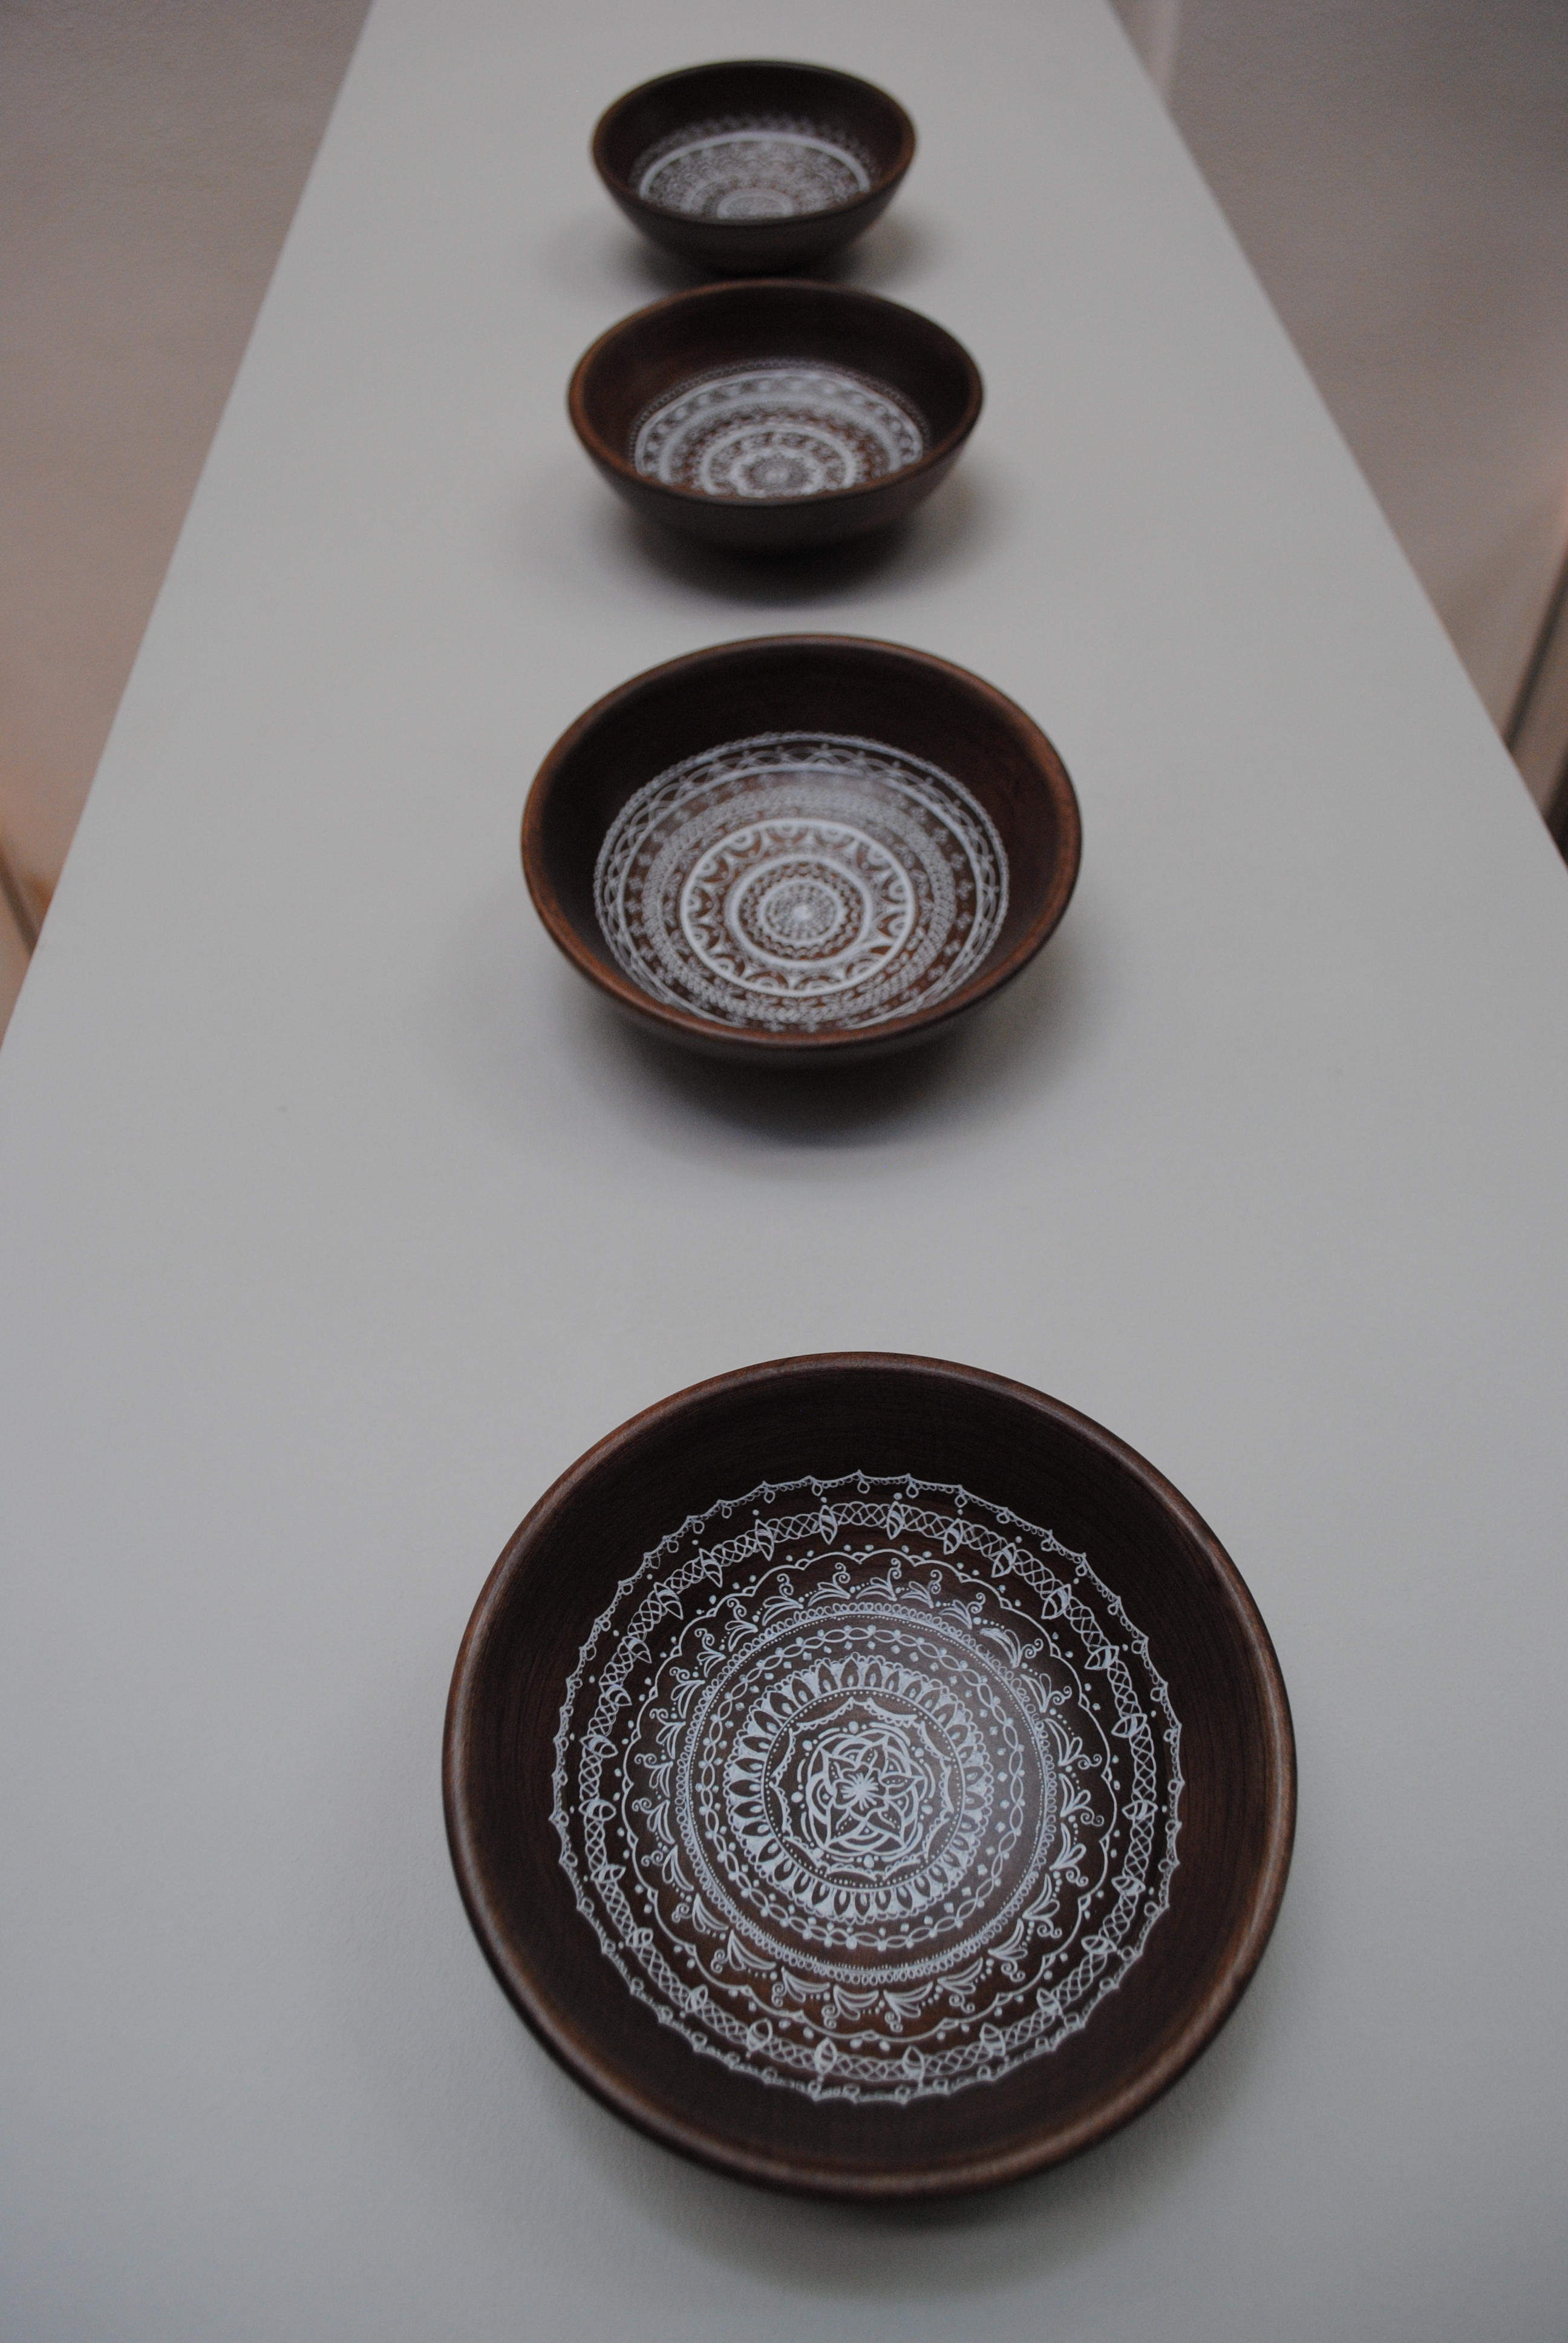 Untitled Circles